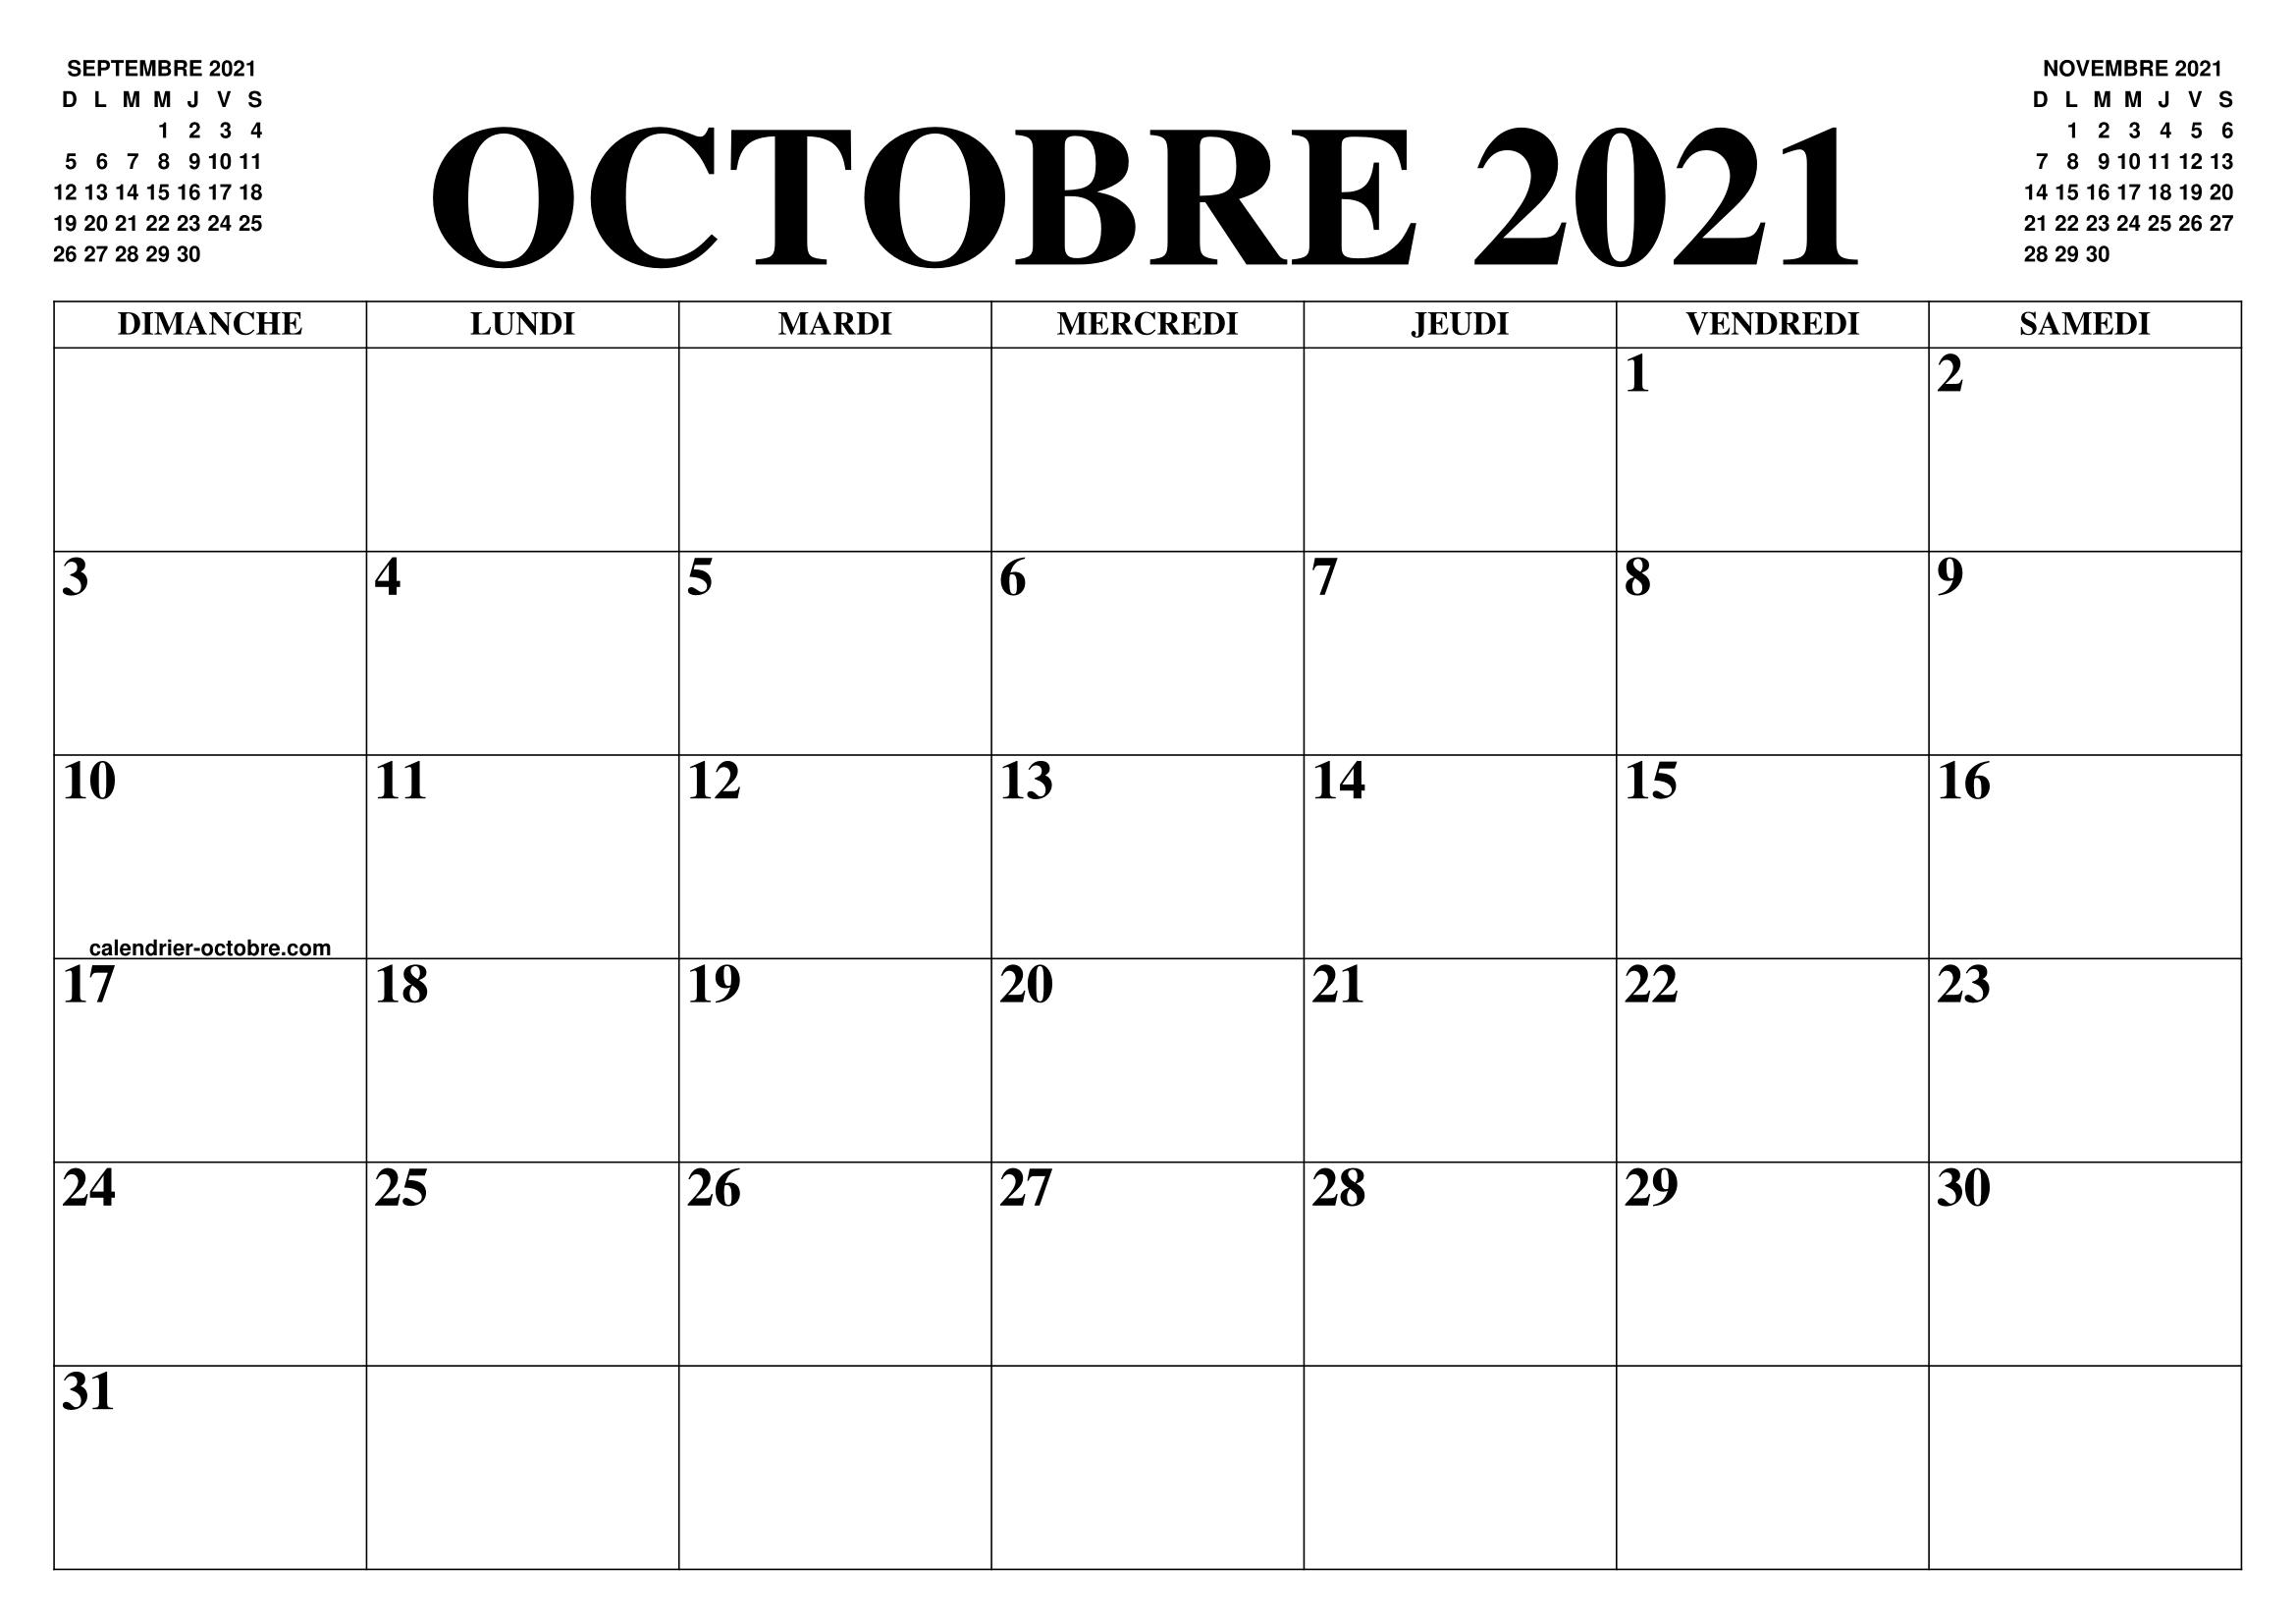 Calendrier 2021 Gratuit.Calendrier Octobre 2021 Le Calendrier Du Mois De Octobre